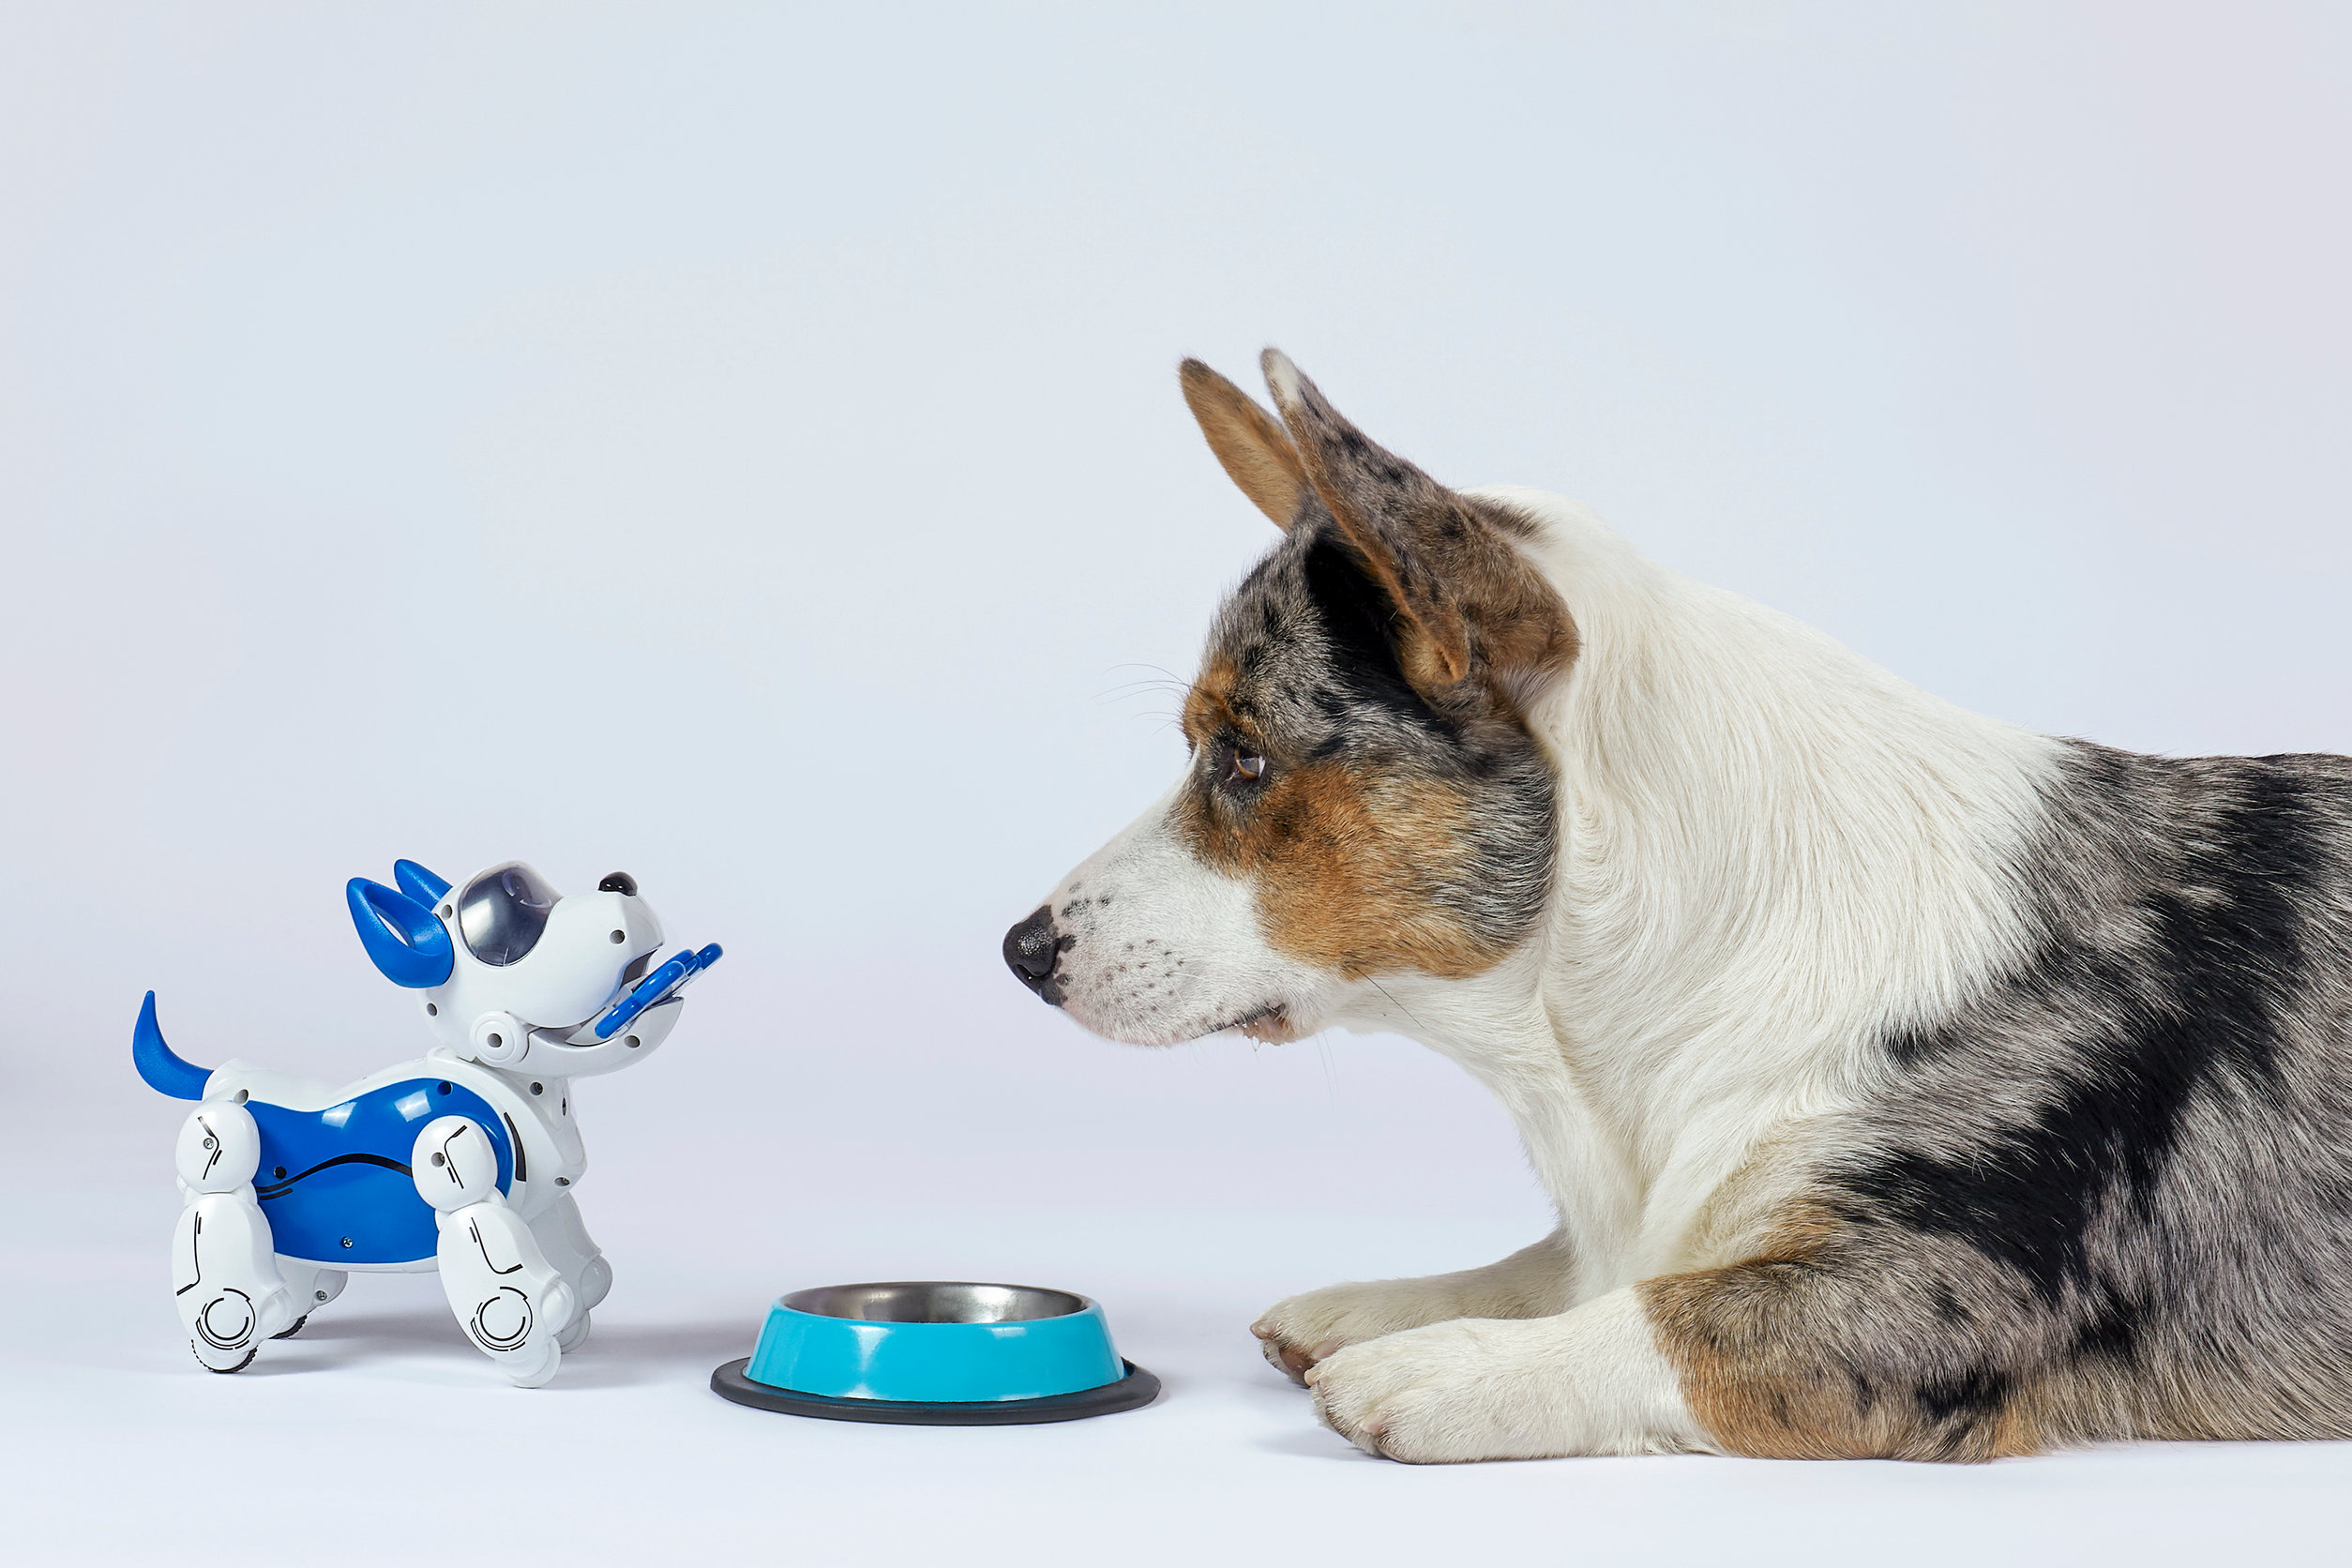 Perro real mirando a perro interactivo